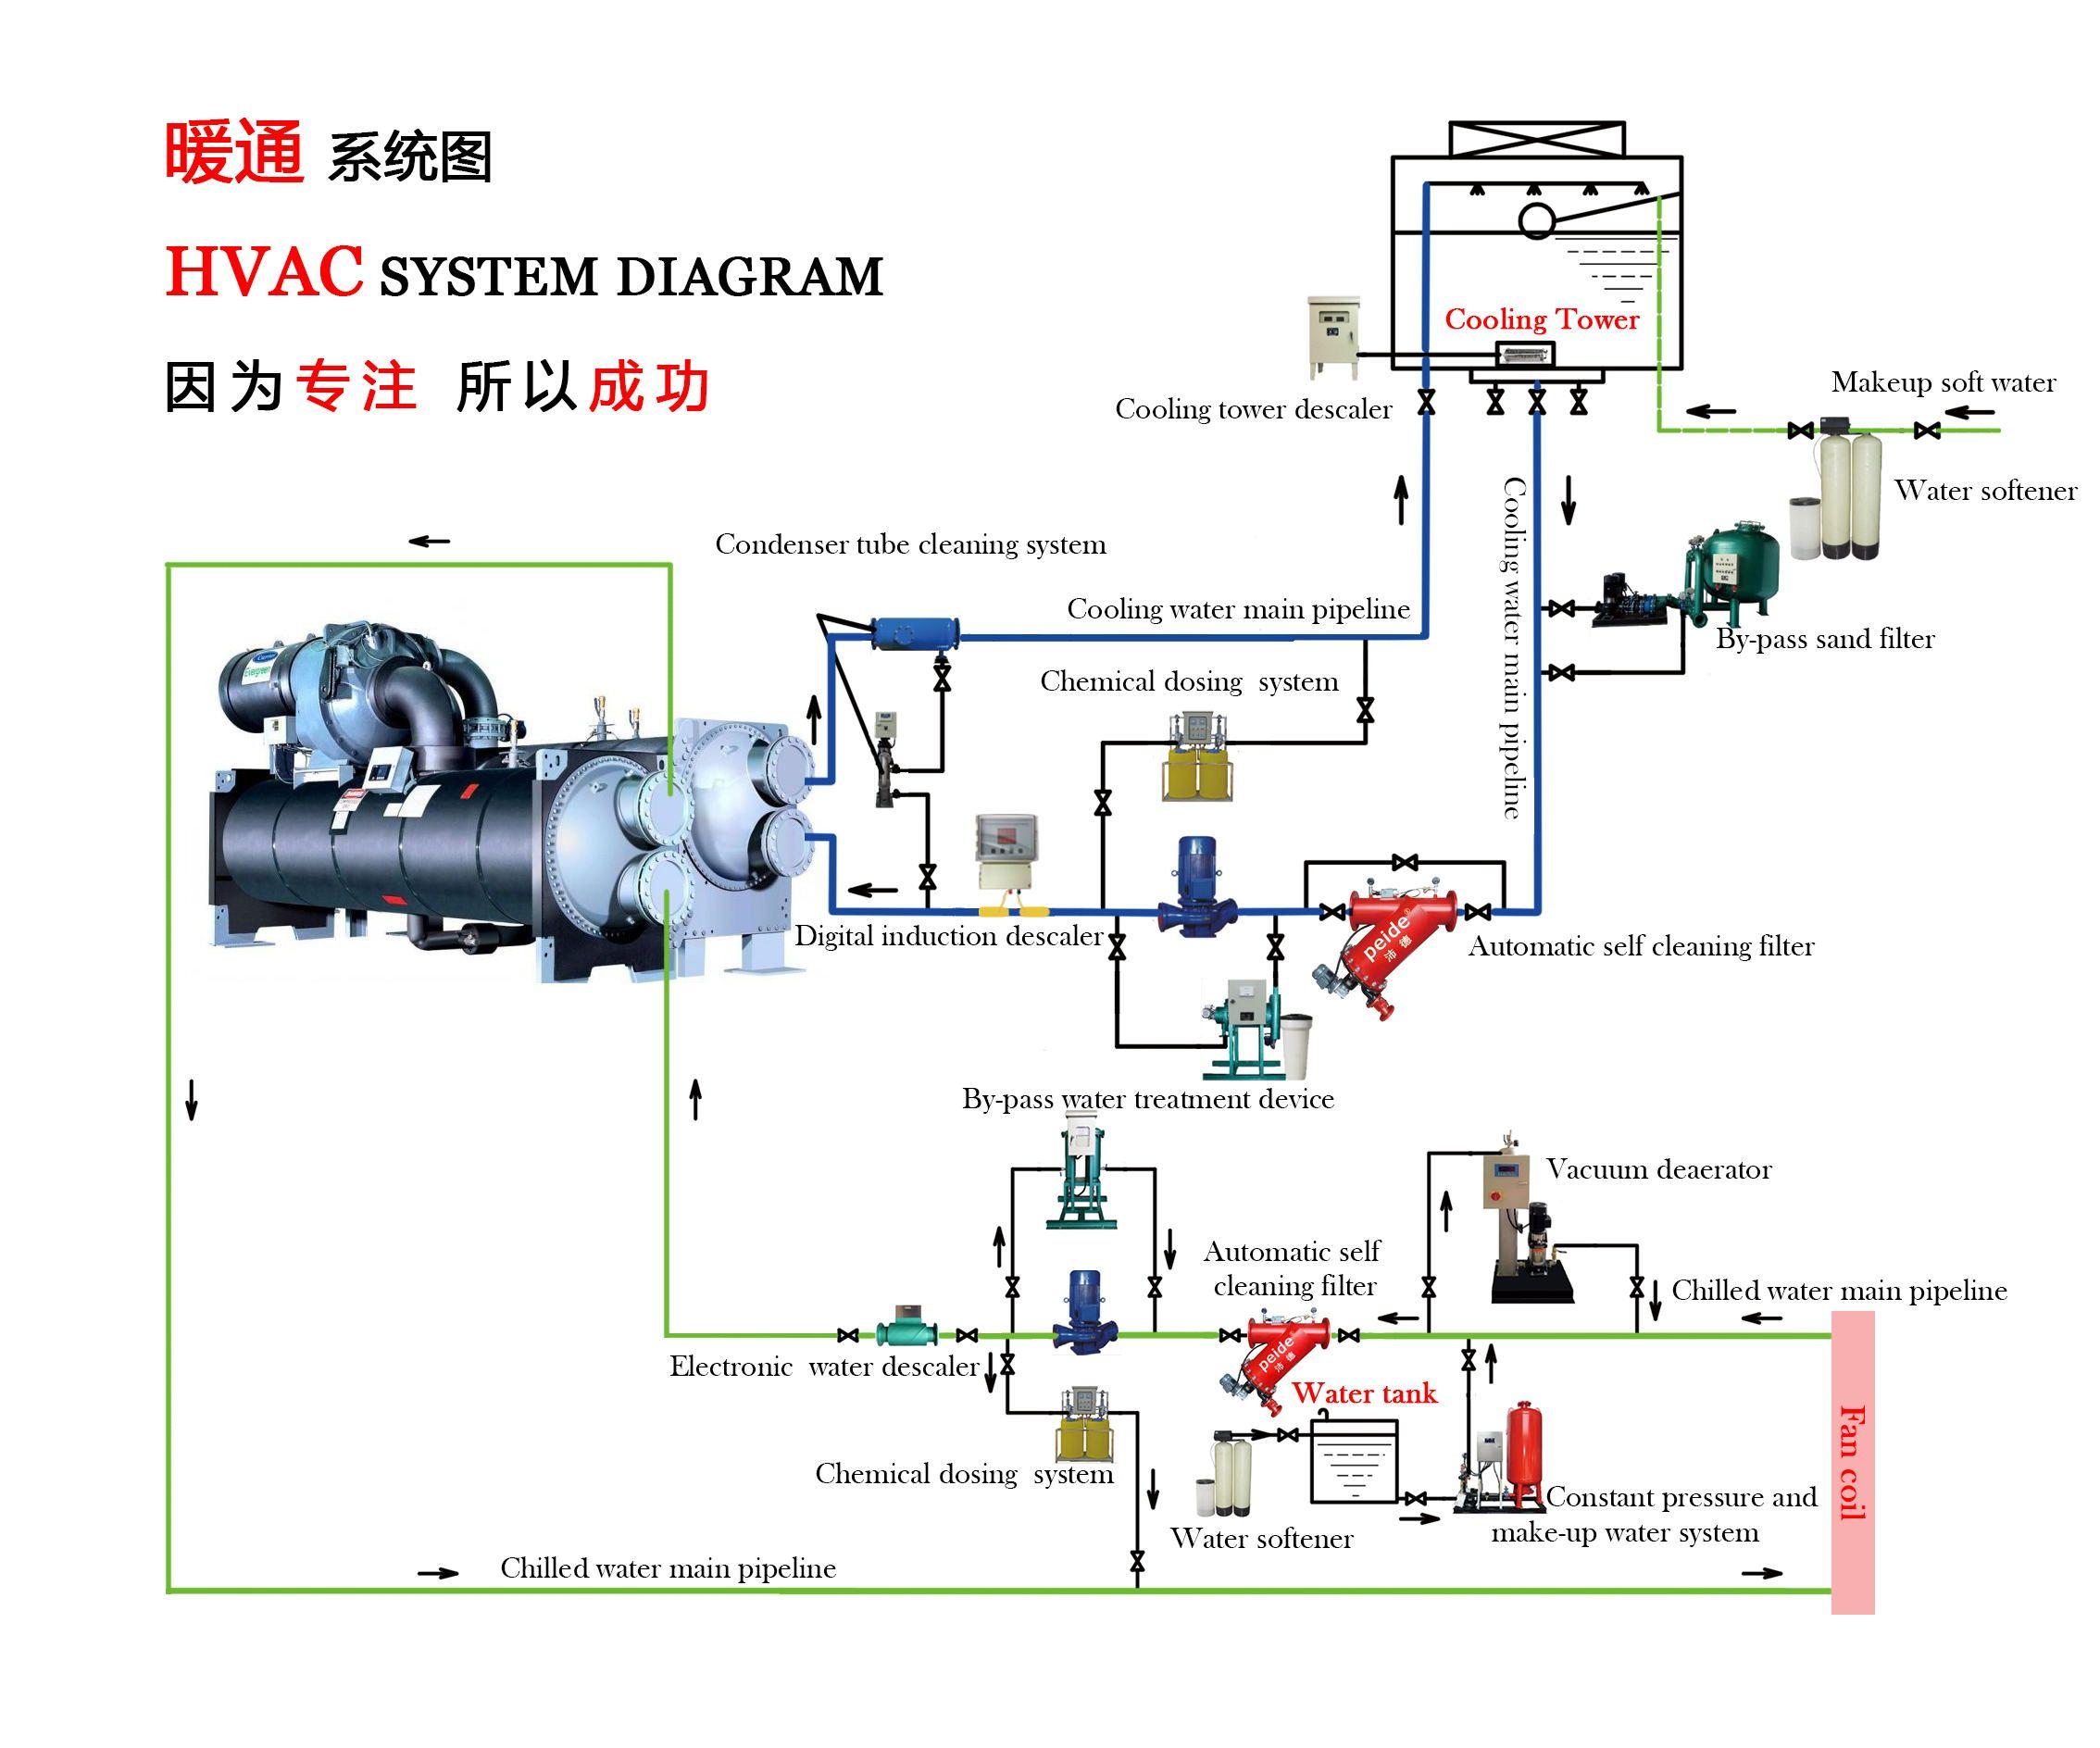 The Hvac System Diagram From Peide Wiring Diagram